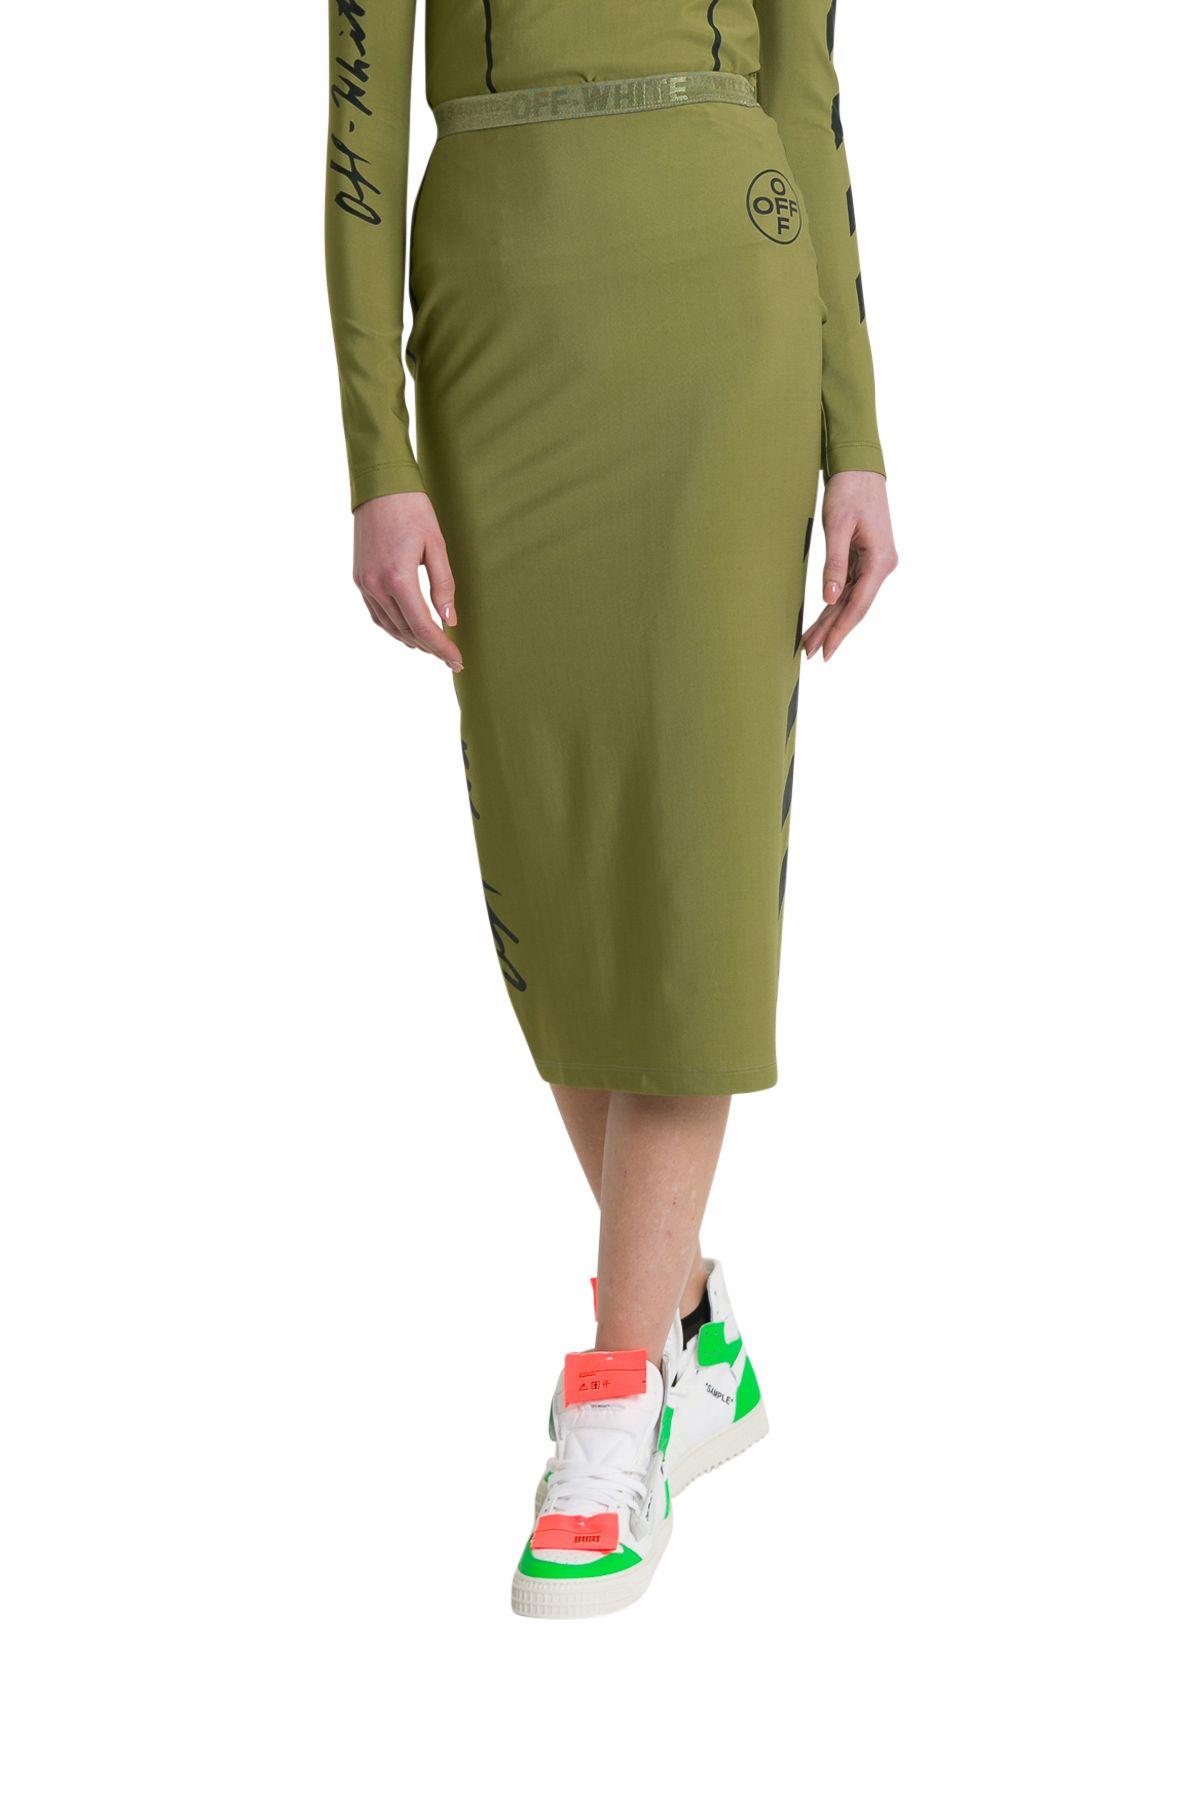 Off-White Military Diag Pencil Skirt